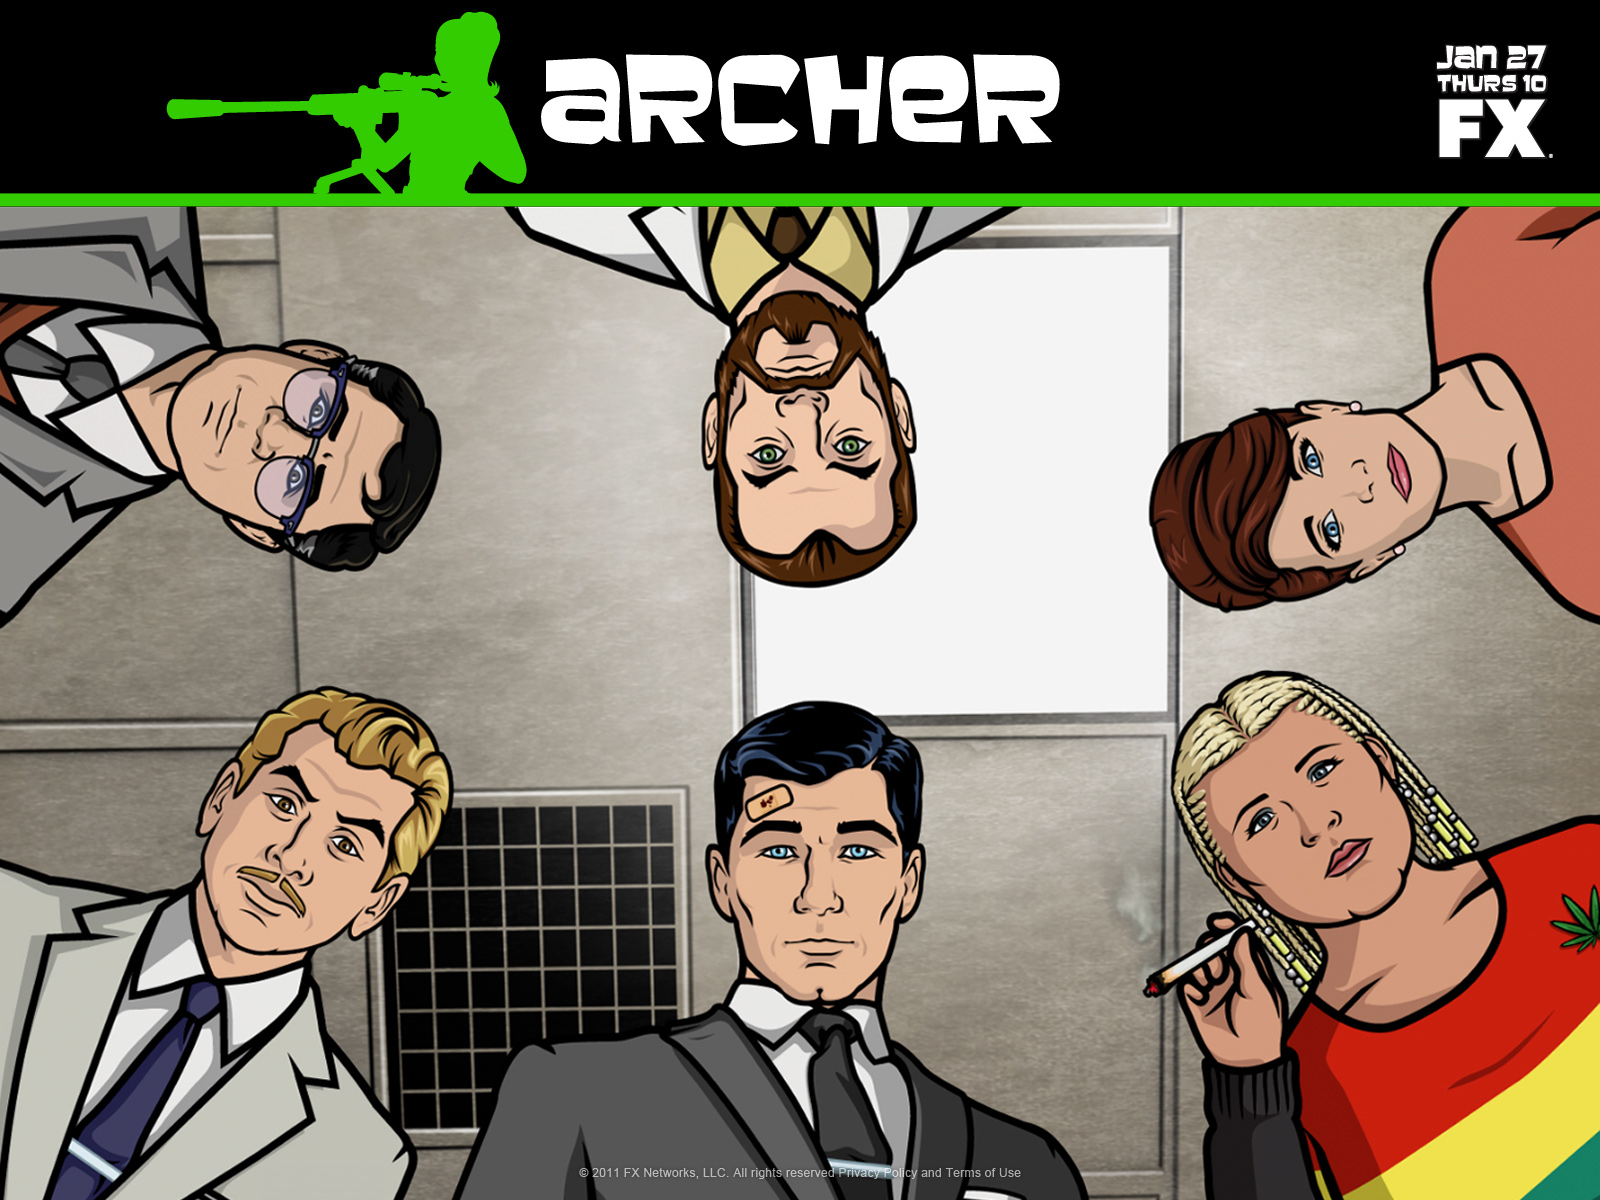 http://4.bp.blogspot.com/-nyNUGsN_zkU/TbUaBkPMZ7I/AAAAAAAAAc4/XXUIVIYoJSo/s1600/archer+wallpaper_1600x1200_04.jpg